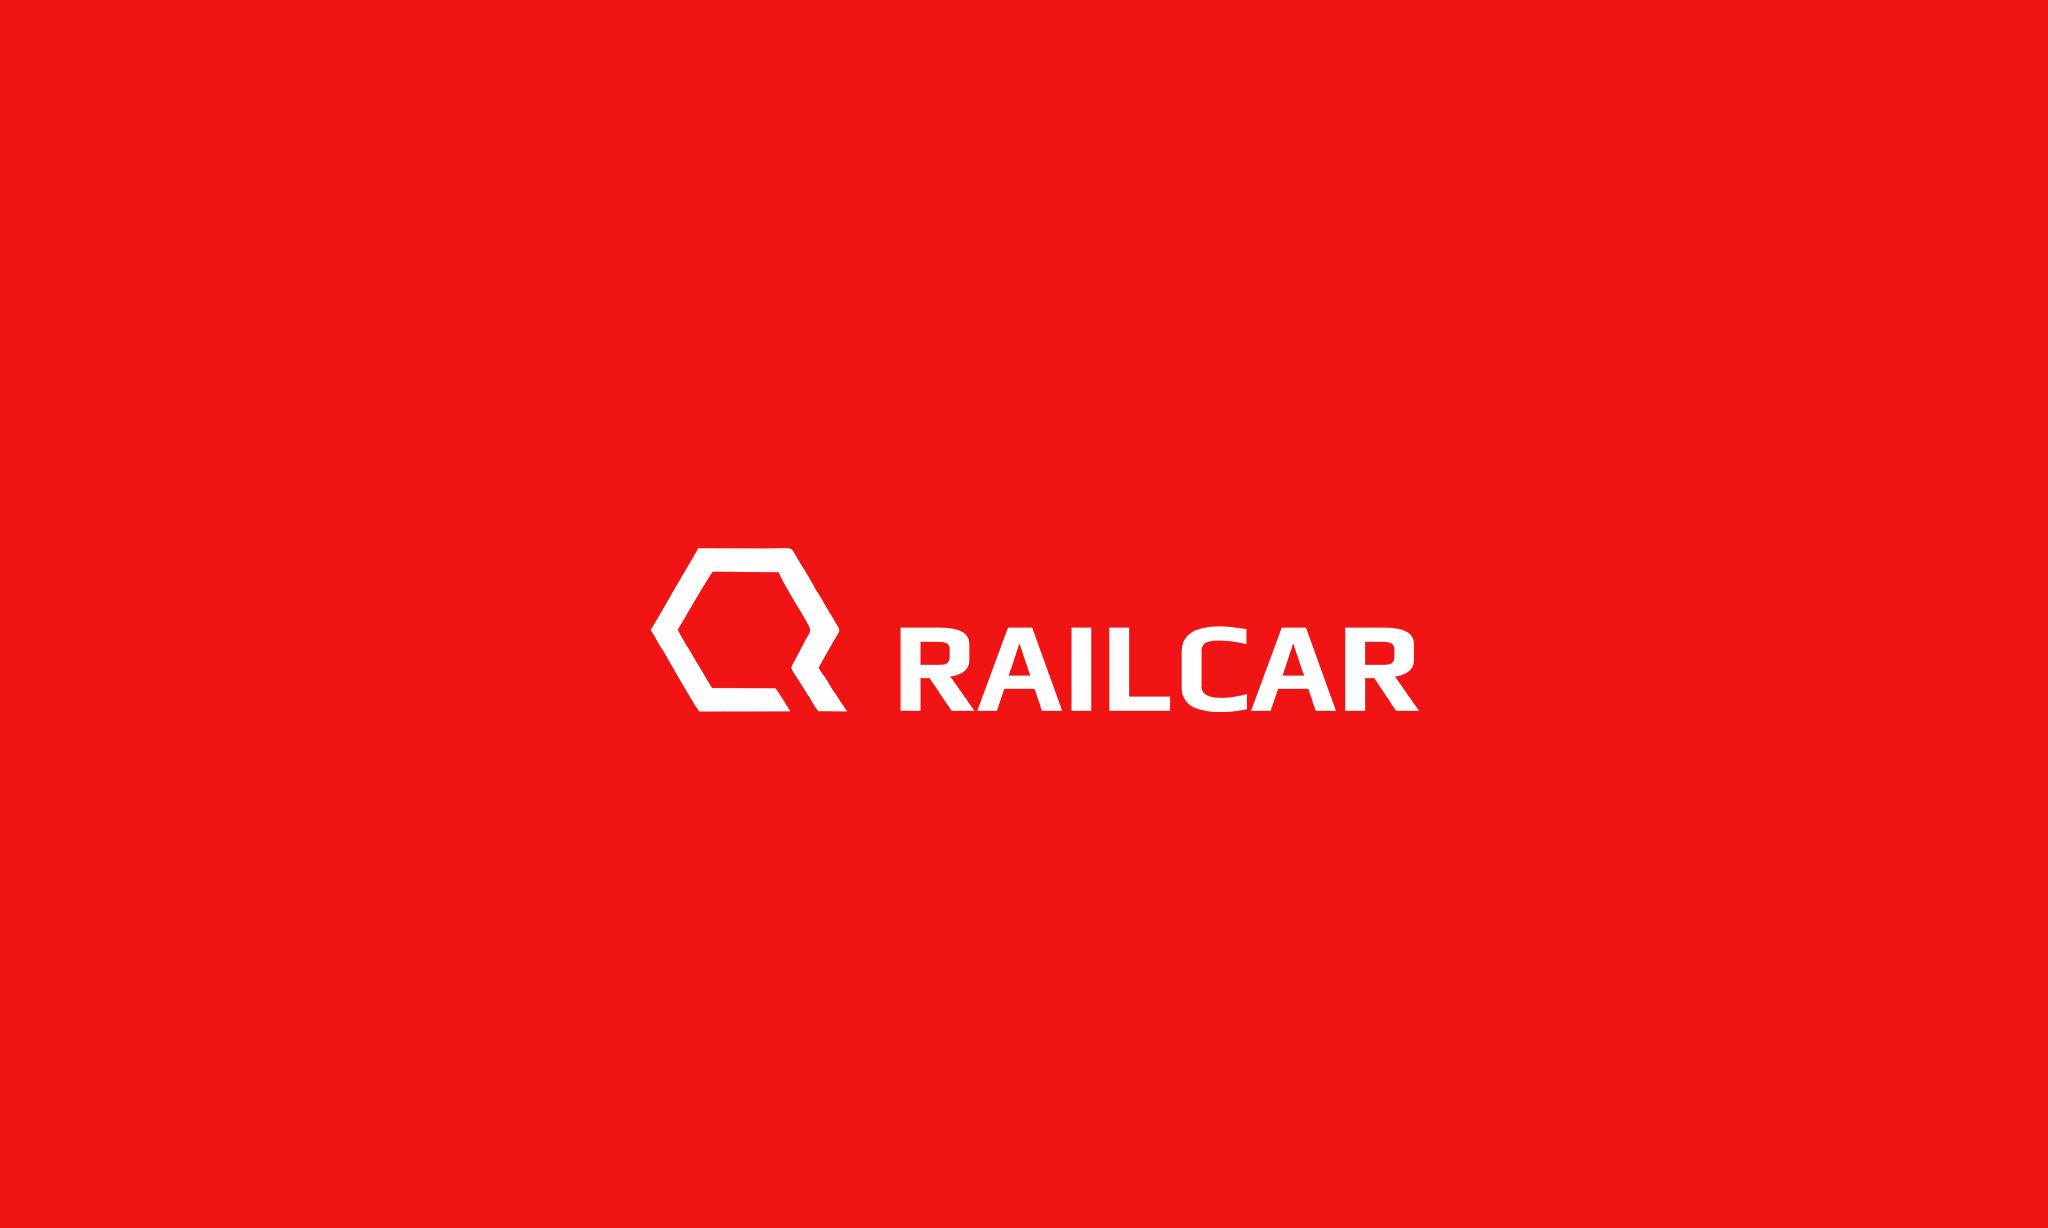 logo-design-railcar